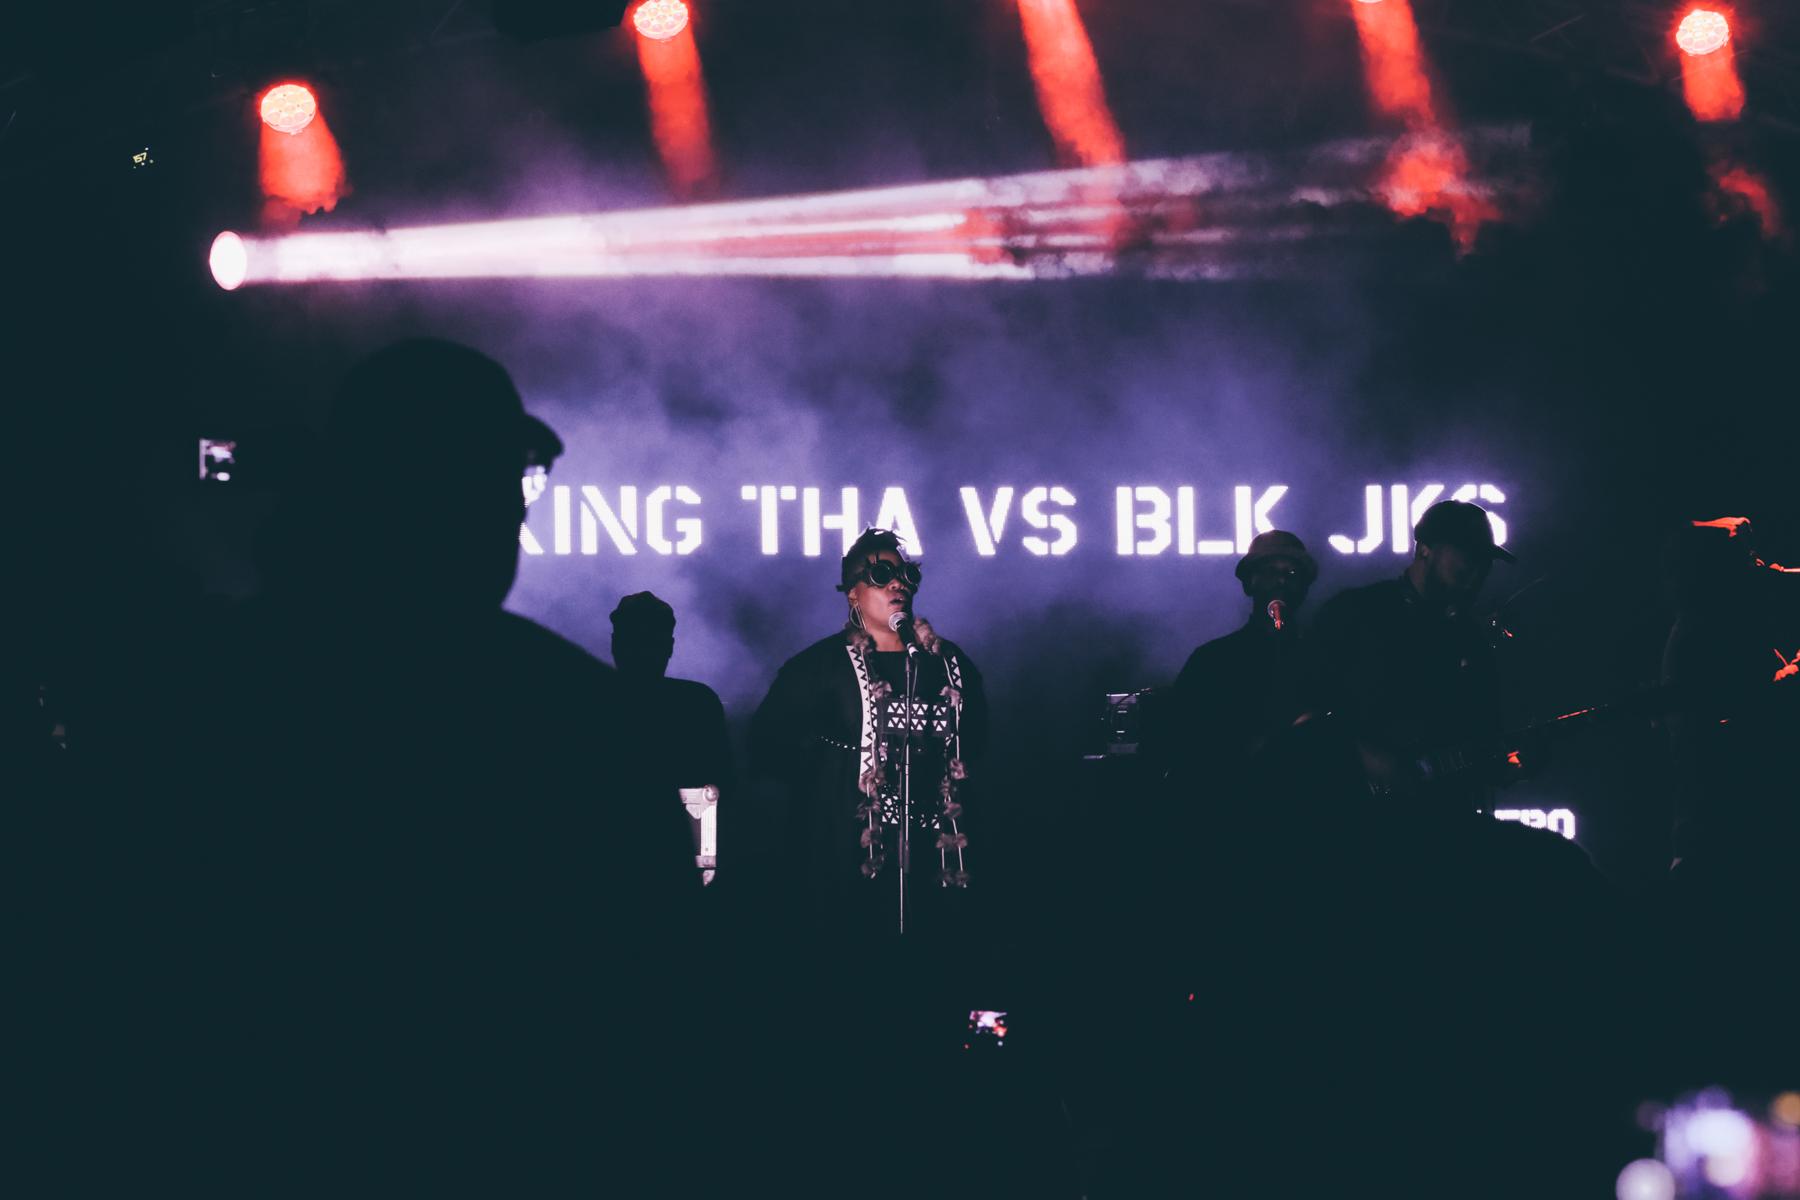 KING Tha vs Blk JK.jpg